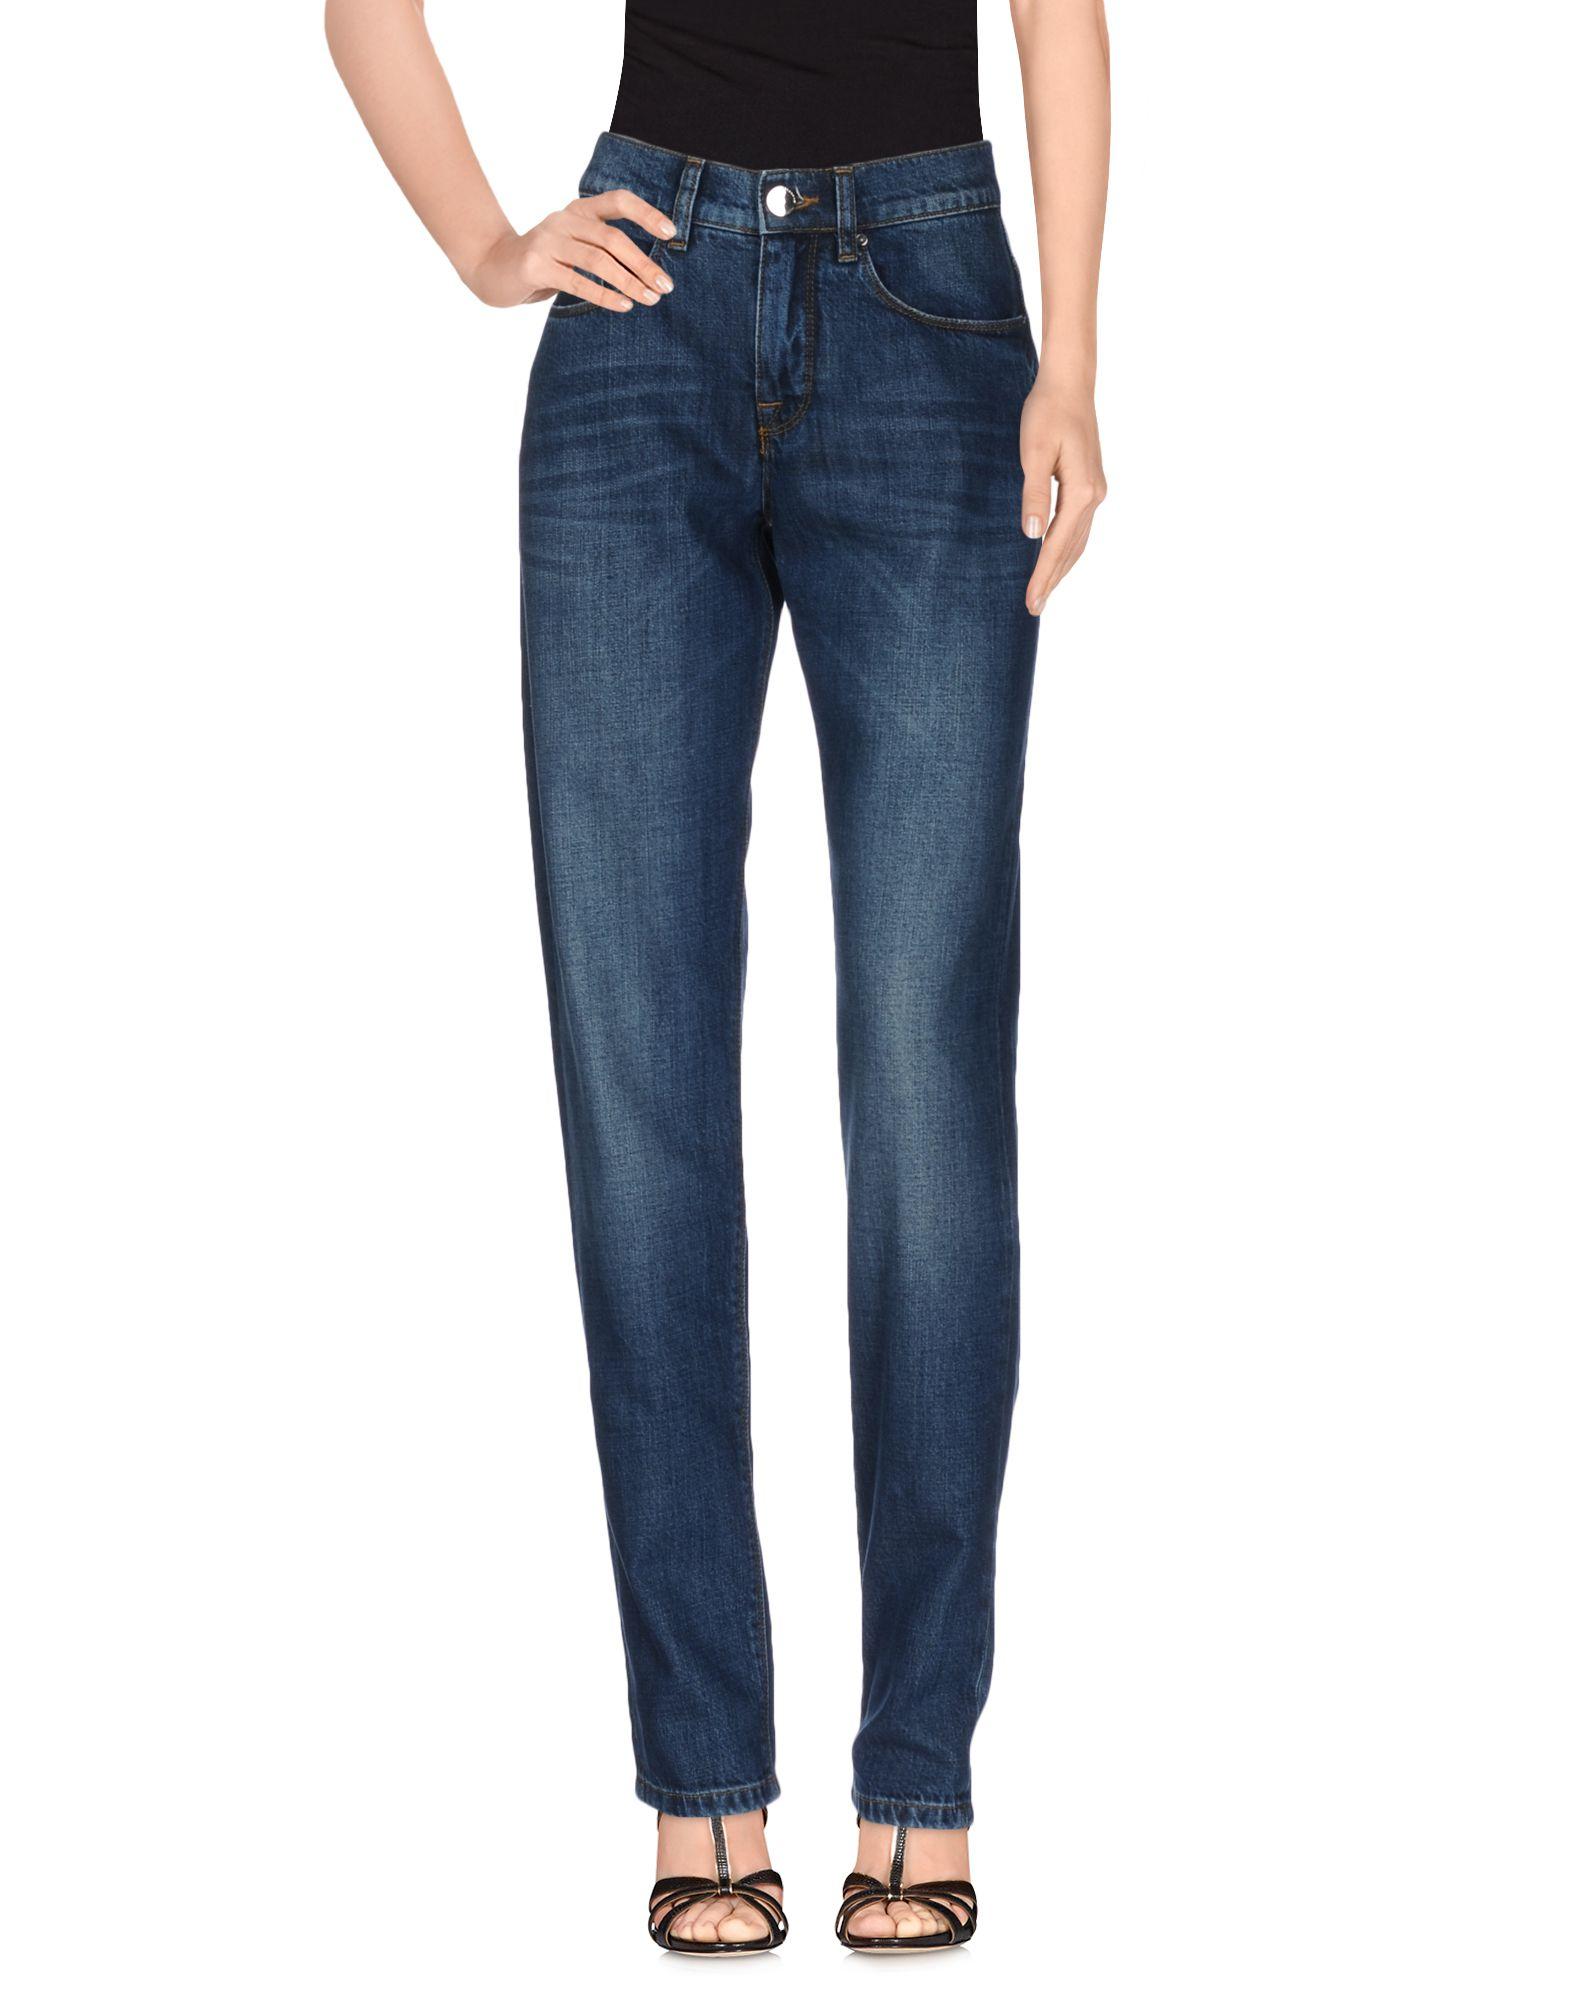 Pantaloni Jeans Victoria Beckham Denim Donna - Acquista online su LT0euTUTFl